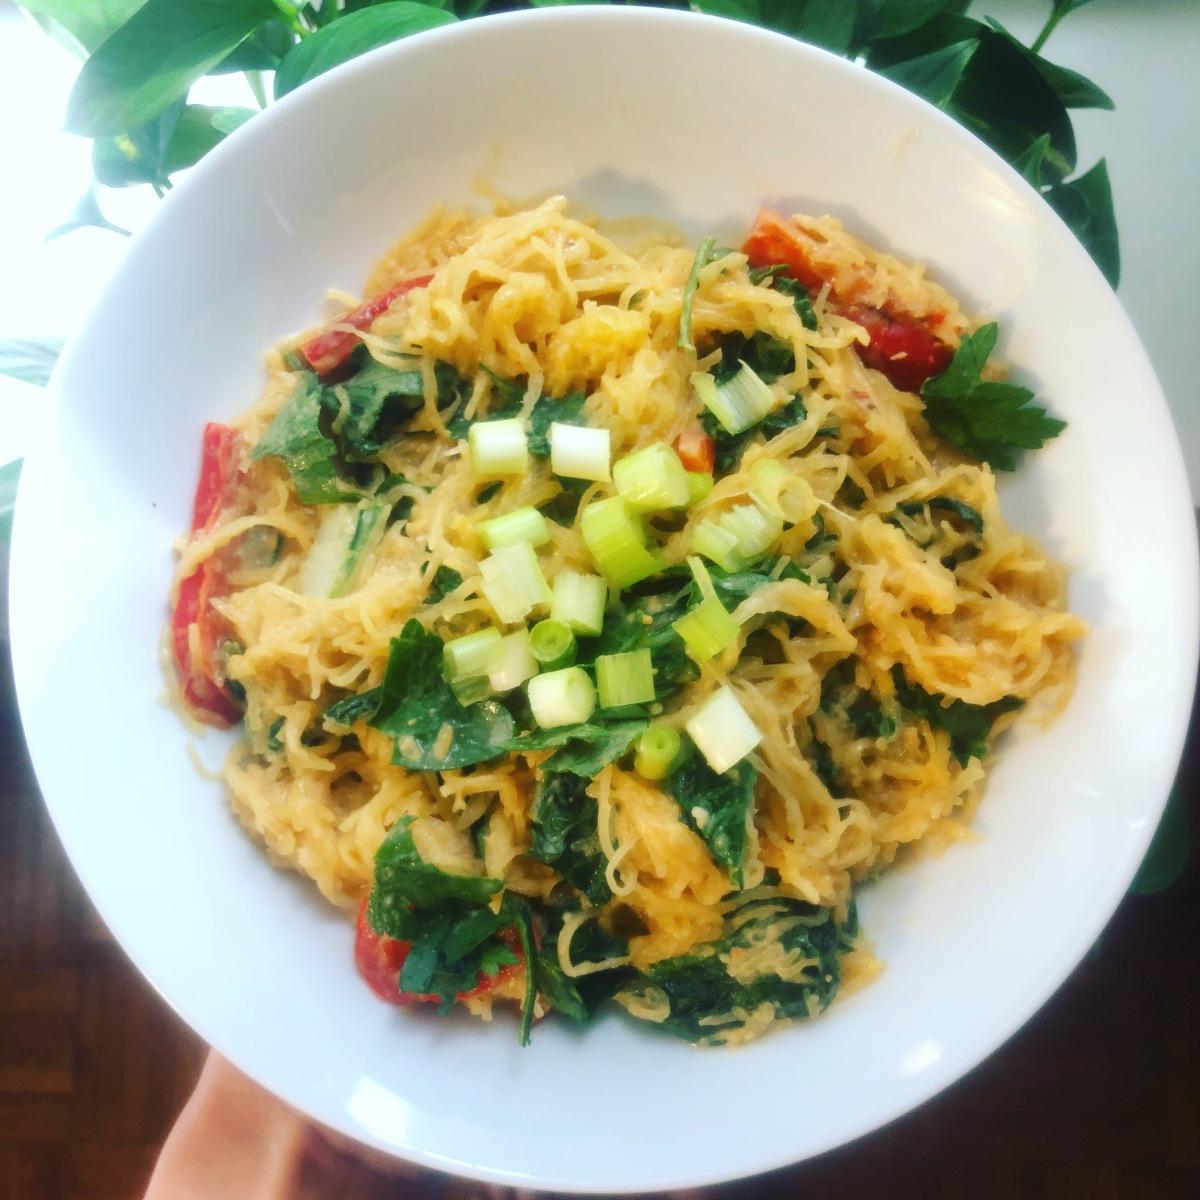 Thai- inspired peanut spaghettisquash